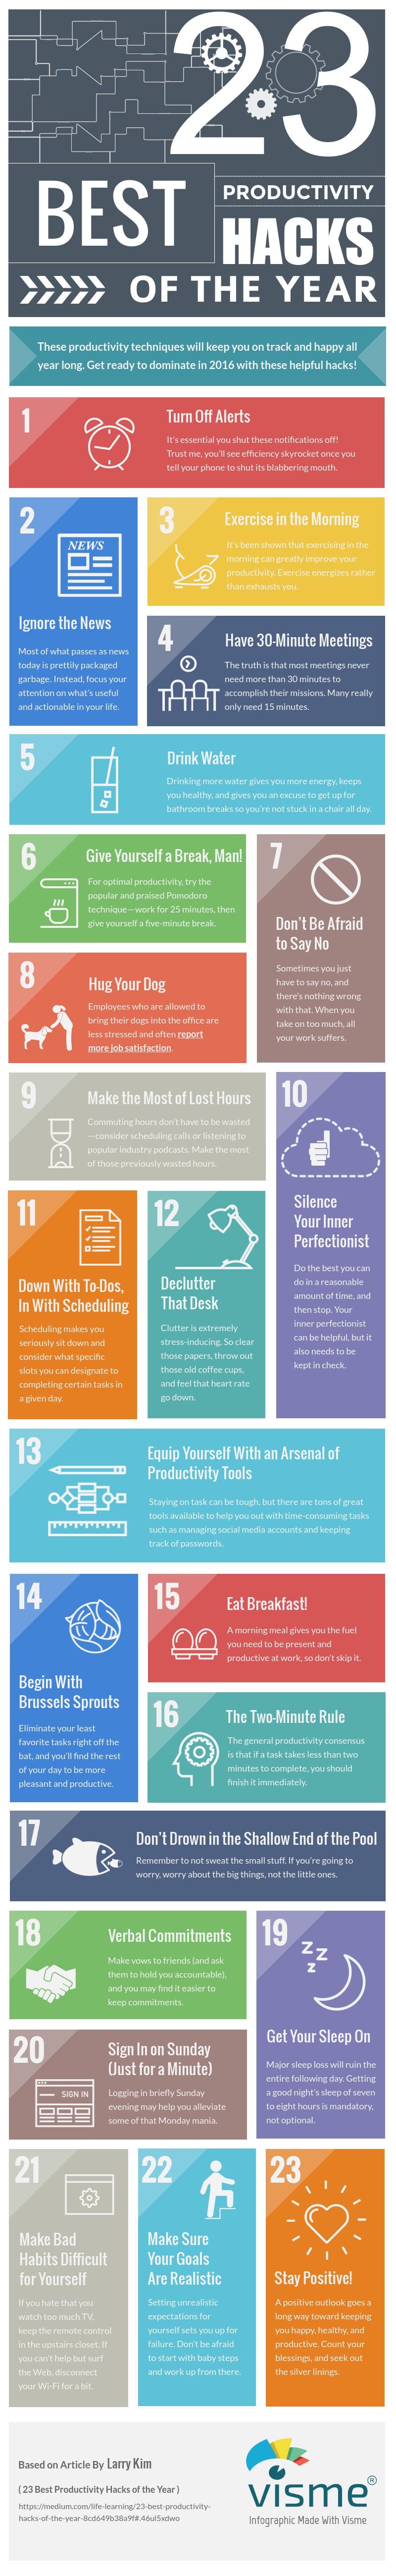 Productivity_Hacks_Infographic_Yoh_Blog.jpg